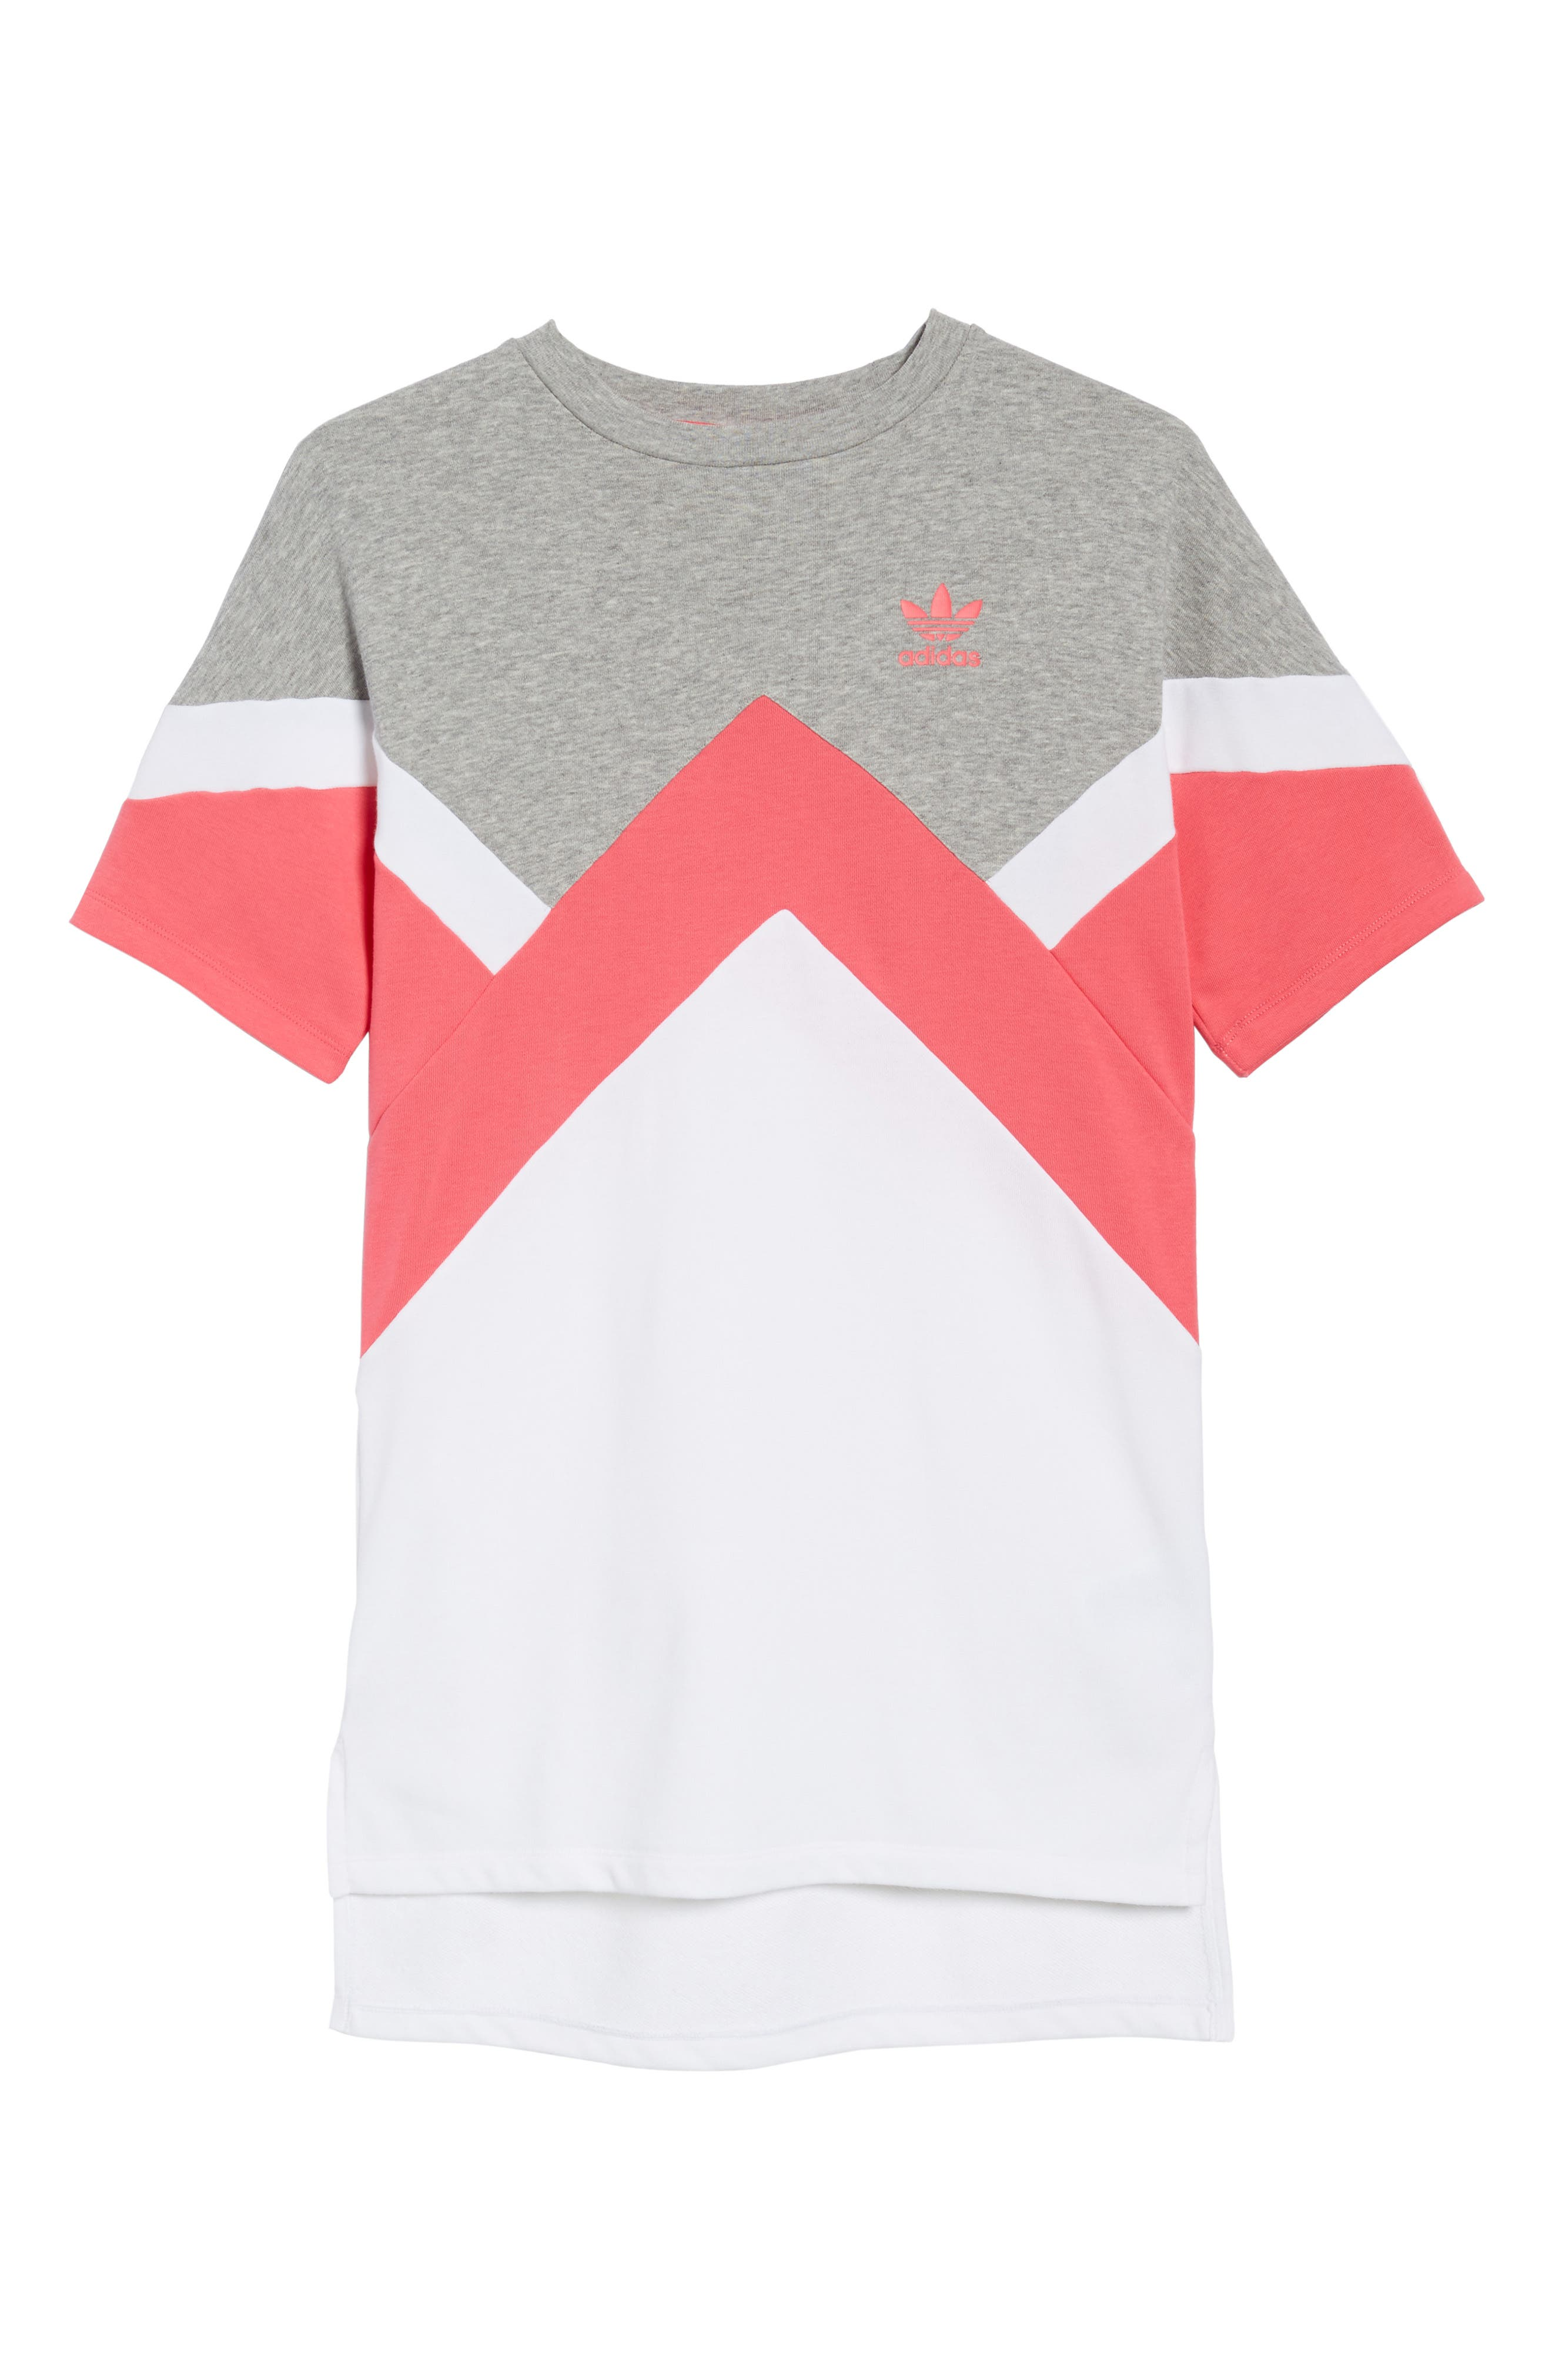 T-Shirt Dress,                         Main,                         color, Grey / Pink/ White